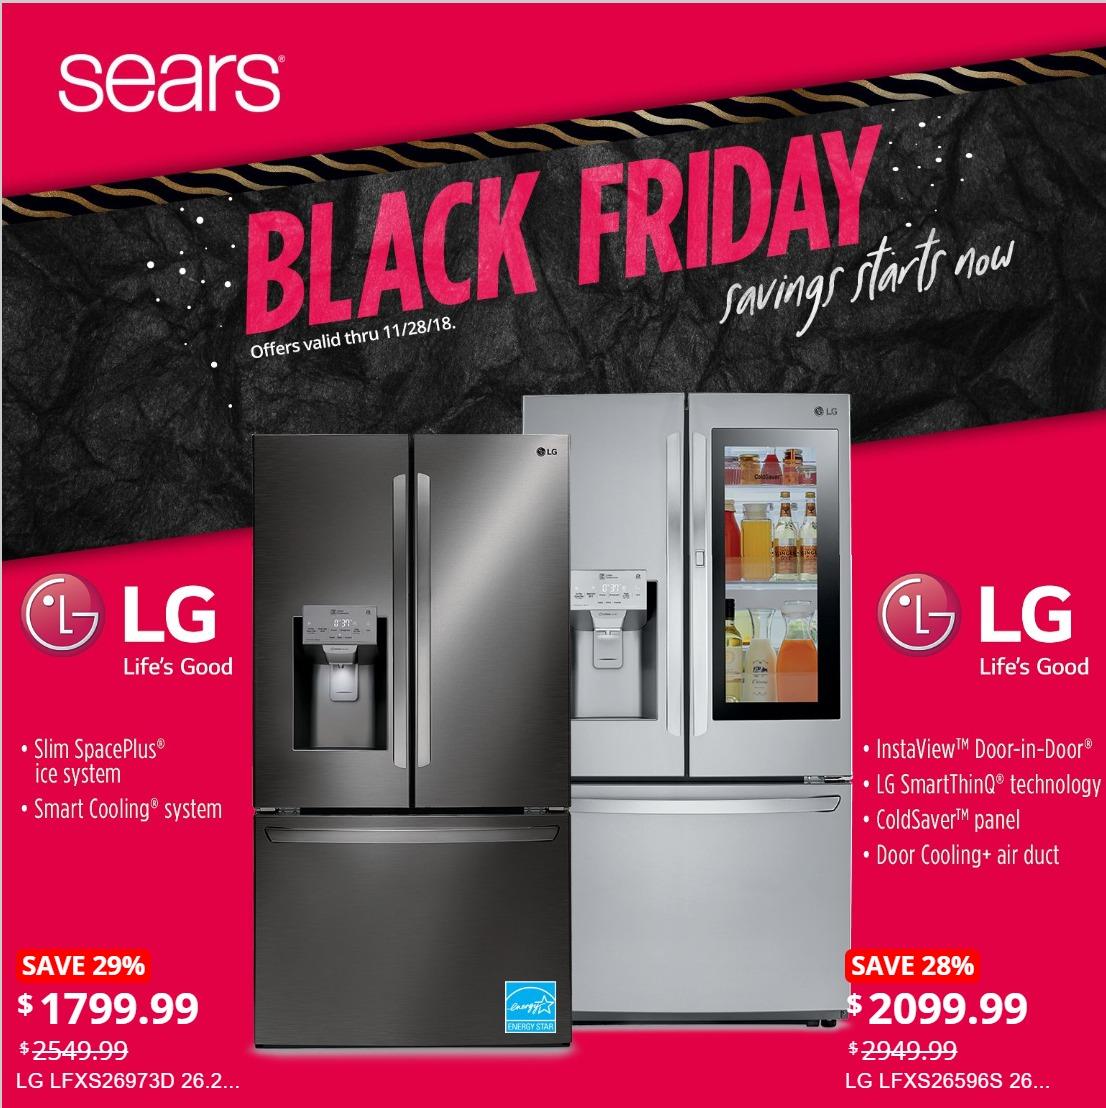 sears black friday home appliances ad sale. Black Bedroom Furniture Sets. Home Design Ideas